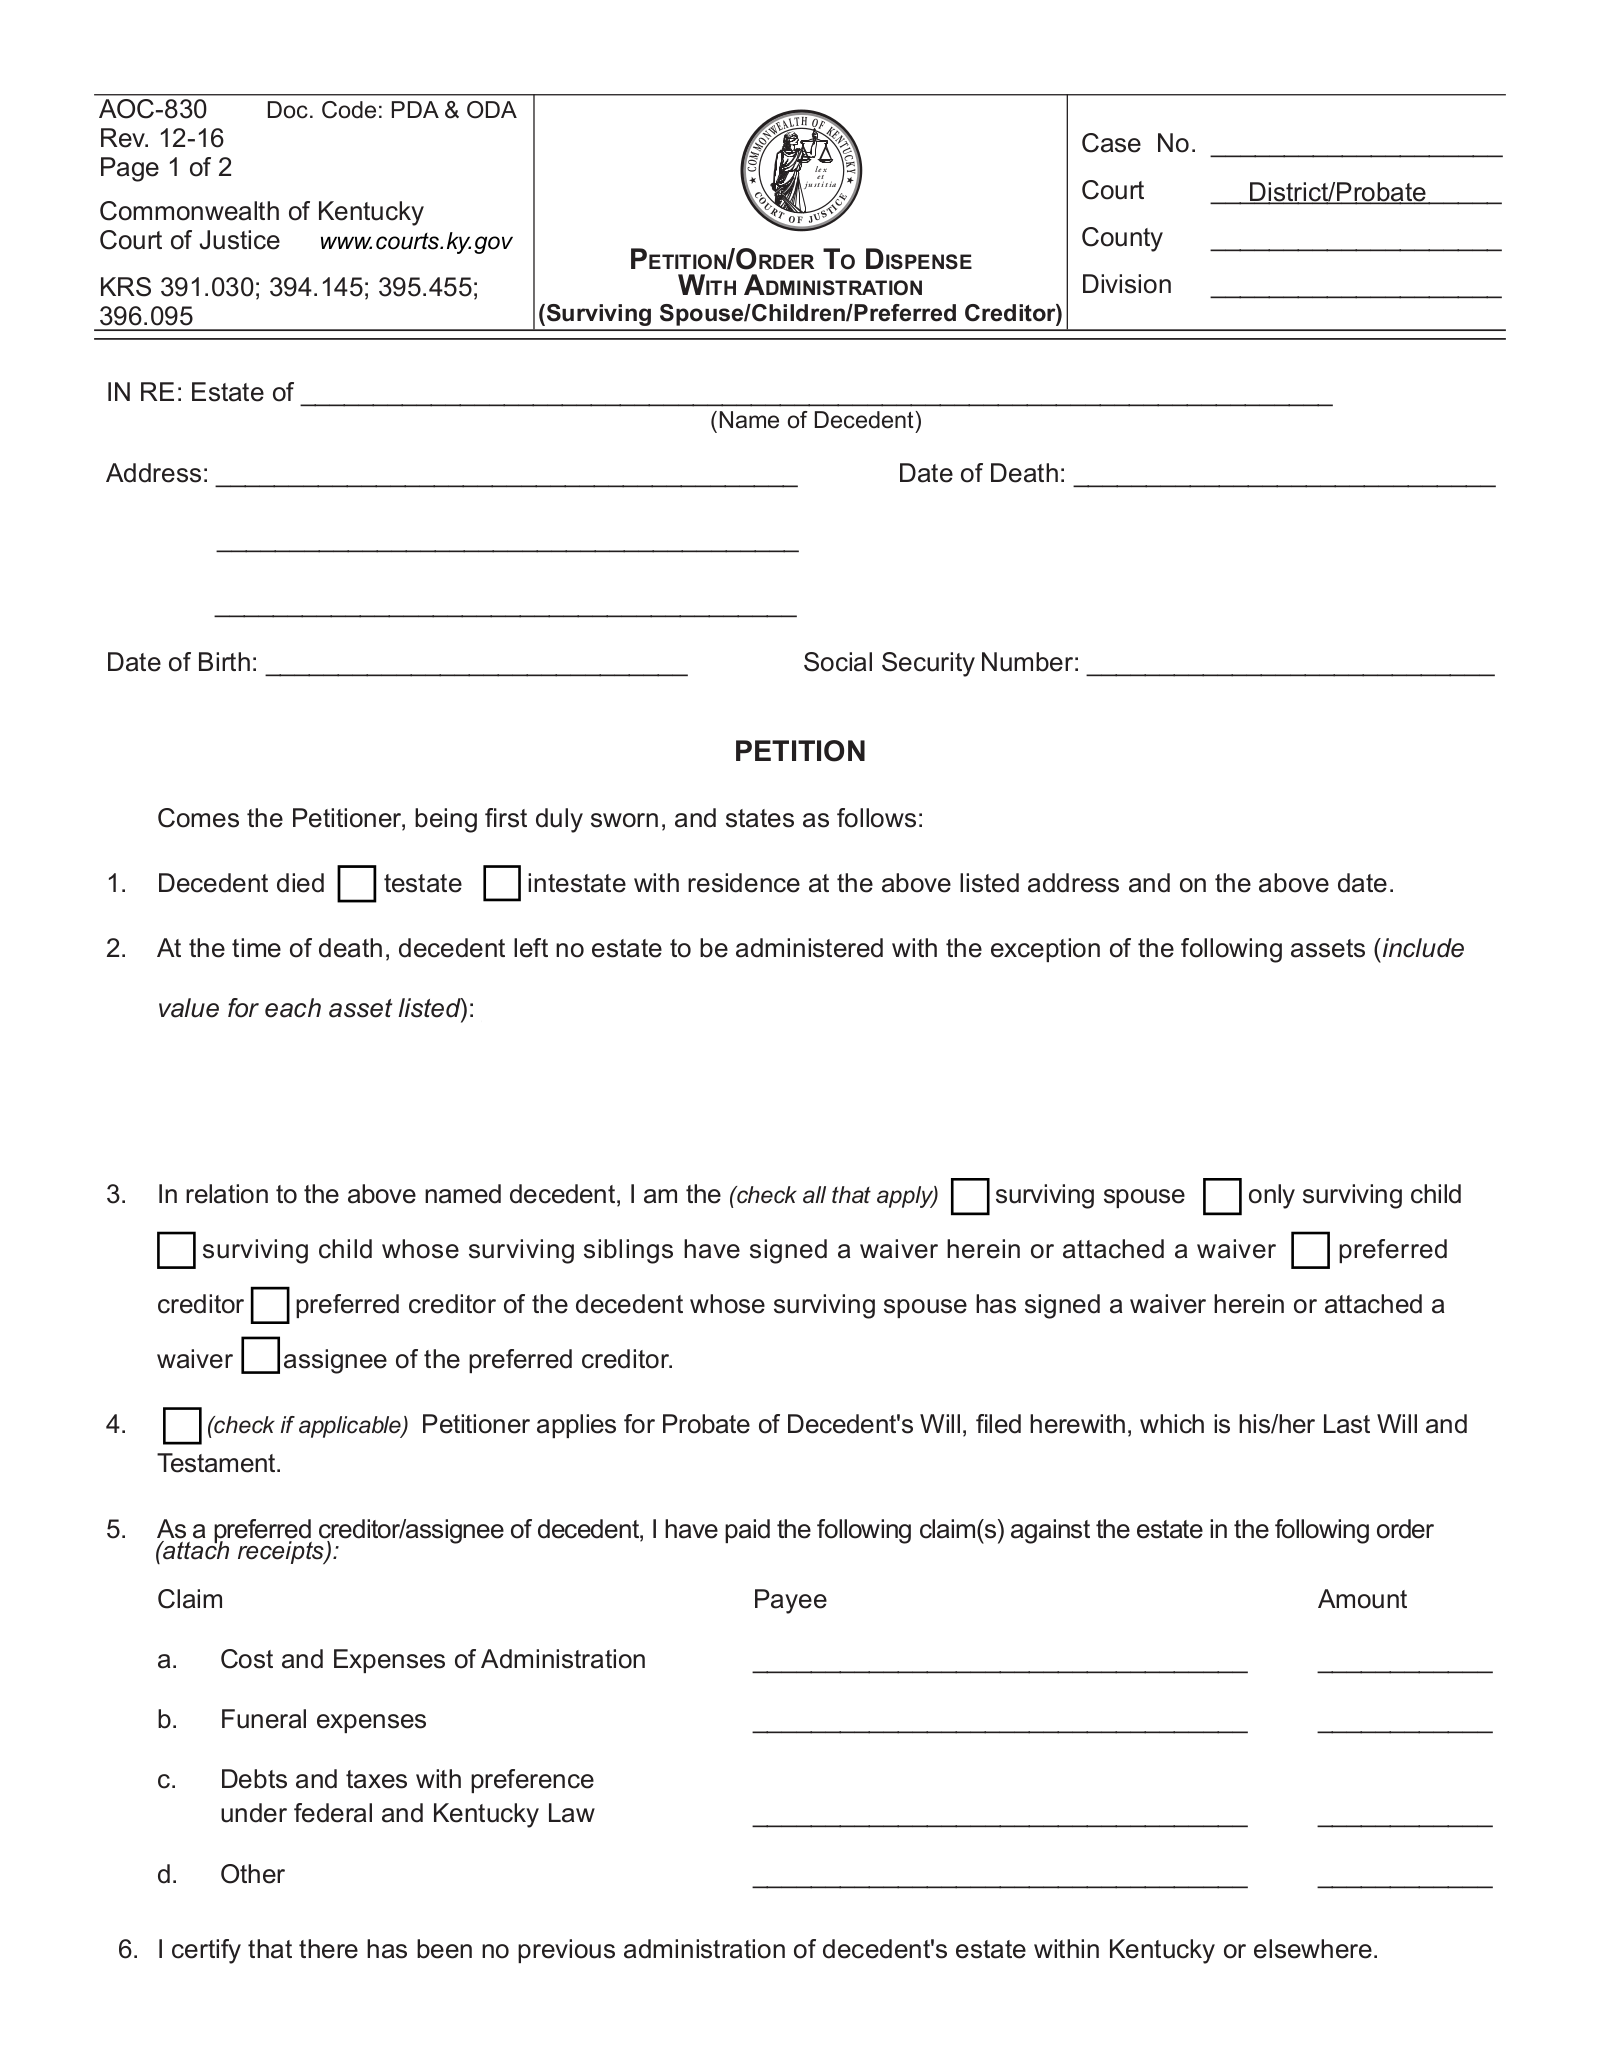 Kentucky Small Estate Affidavit   Form AOC-830   eForms